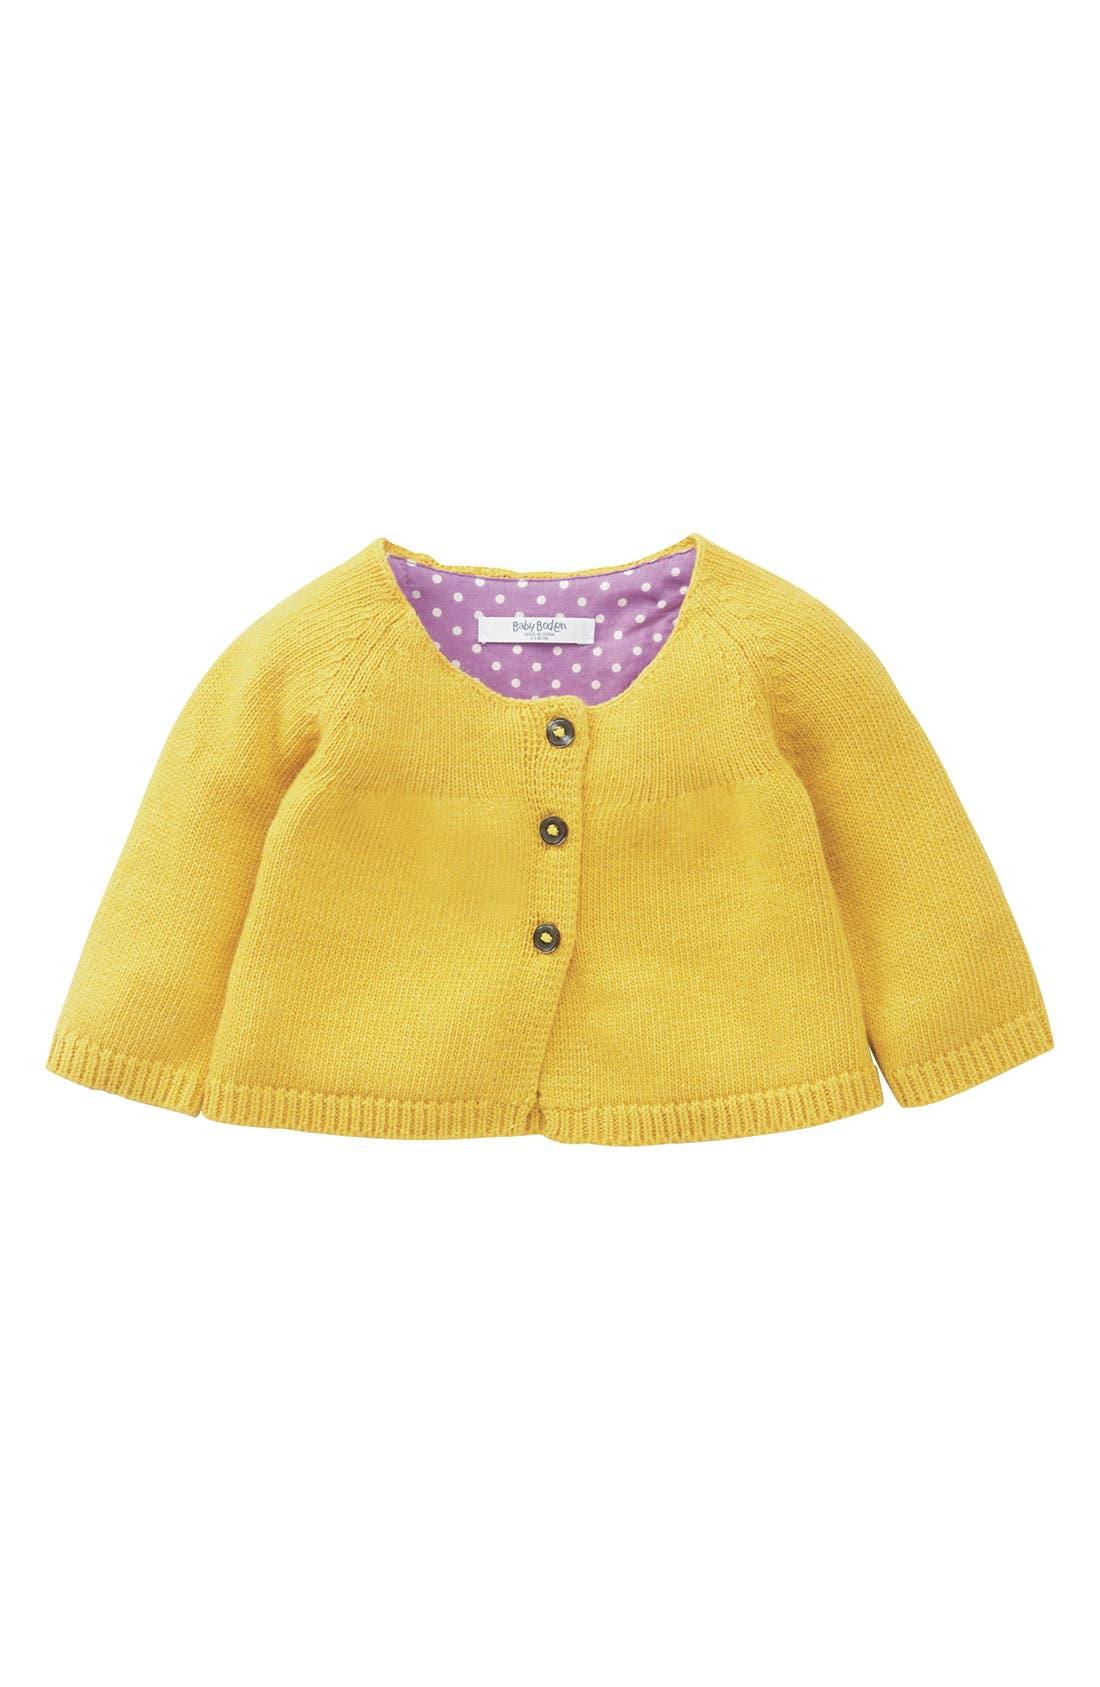 Main Image - Mini Boden Babydoll Cardigan (Infant)